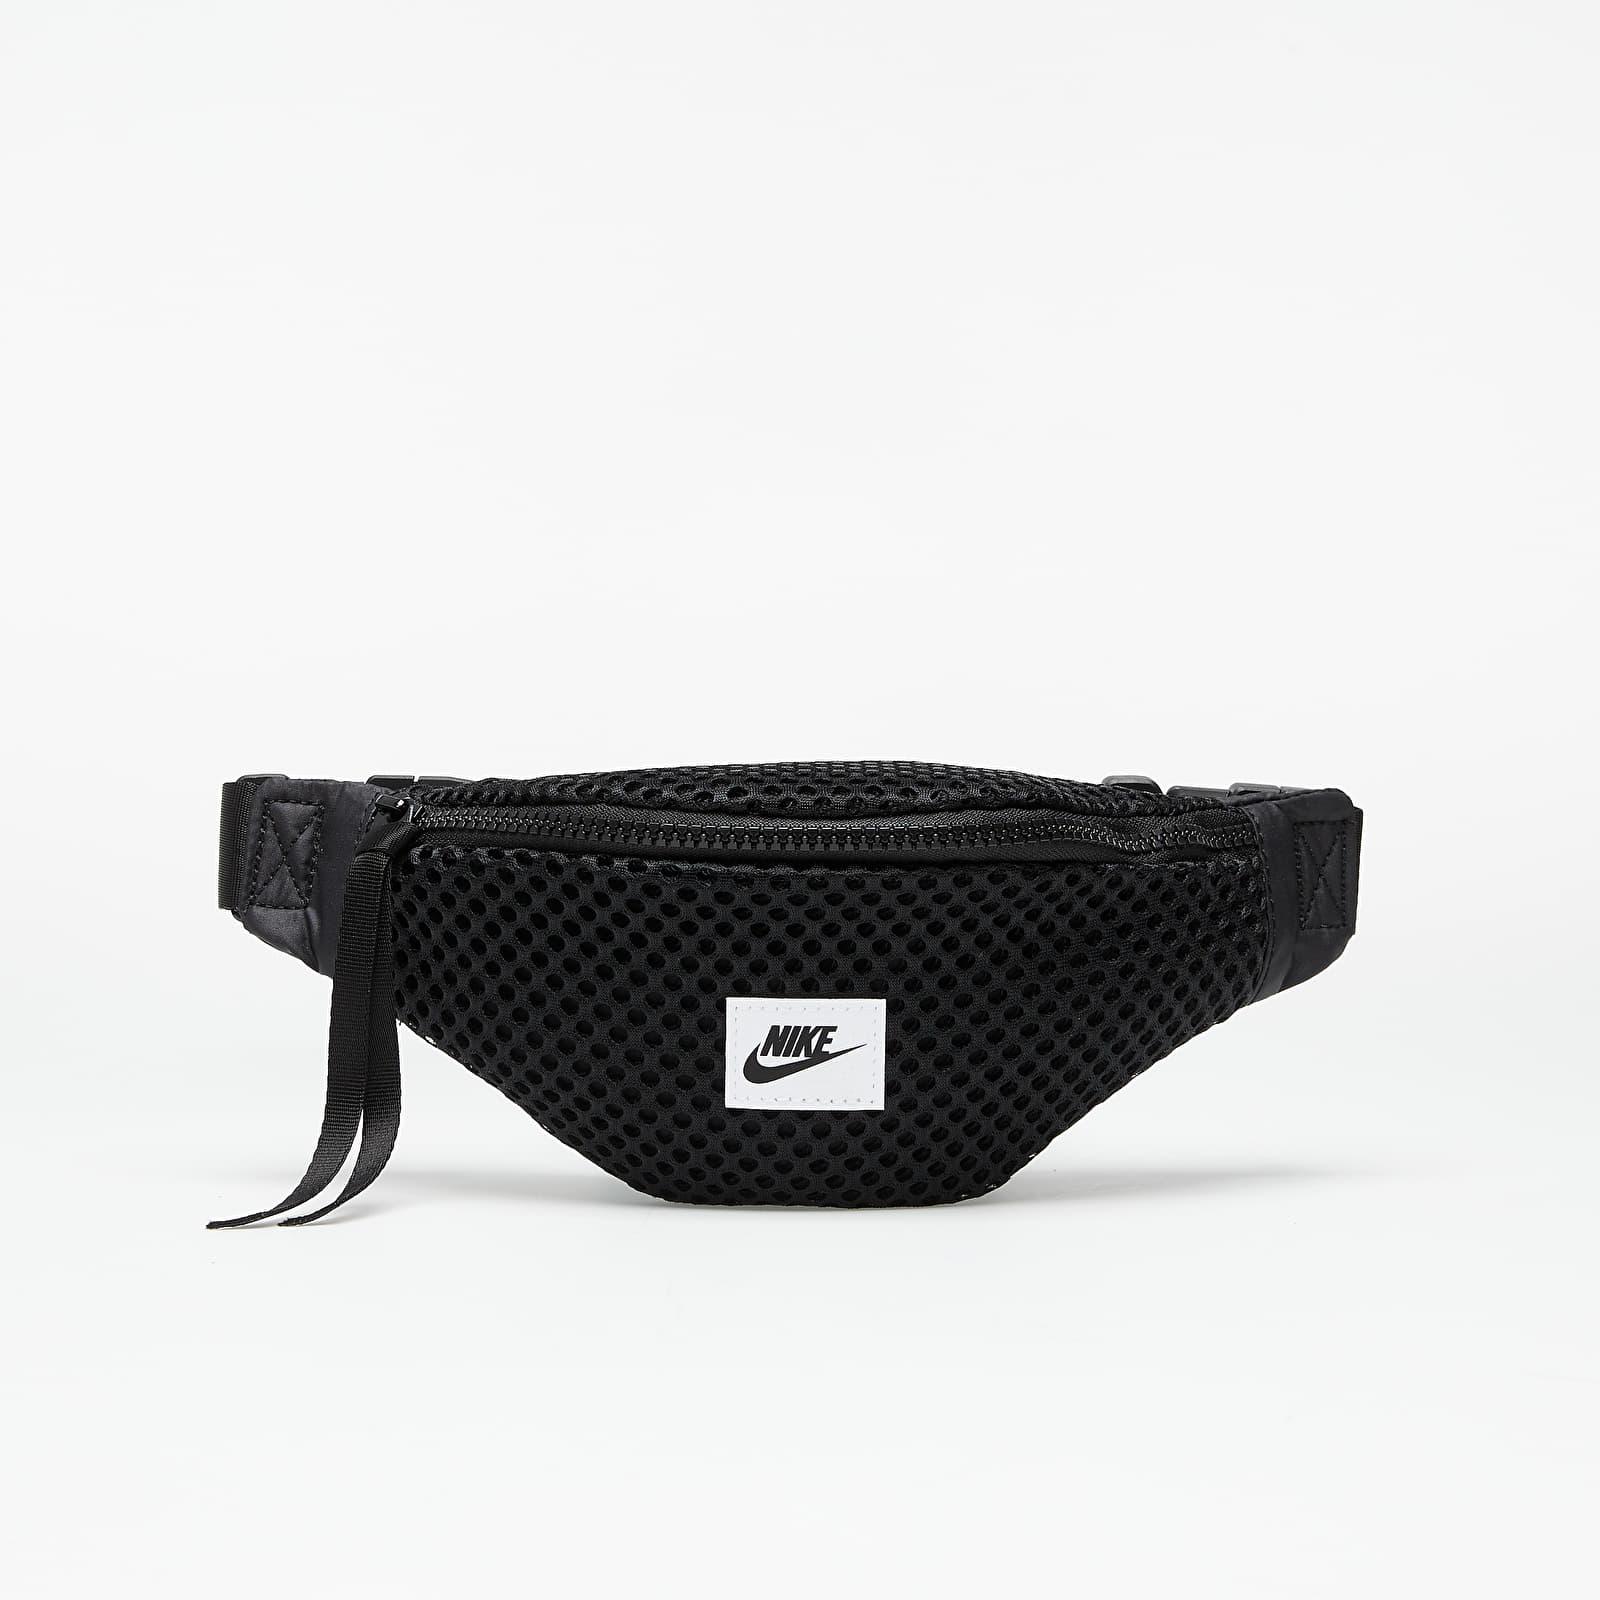 Ľadvinky Nike Air Fanny Pack (Small Items) Black/ Black/ Black